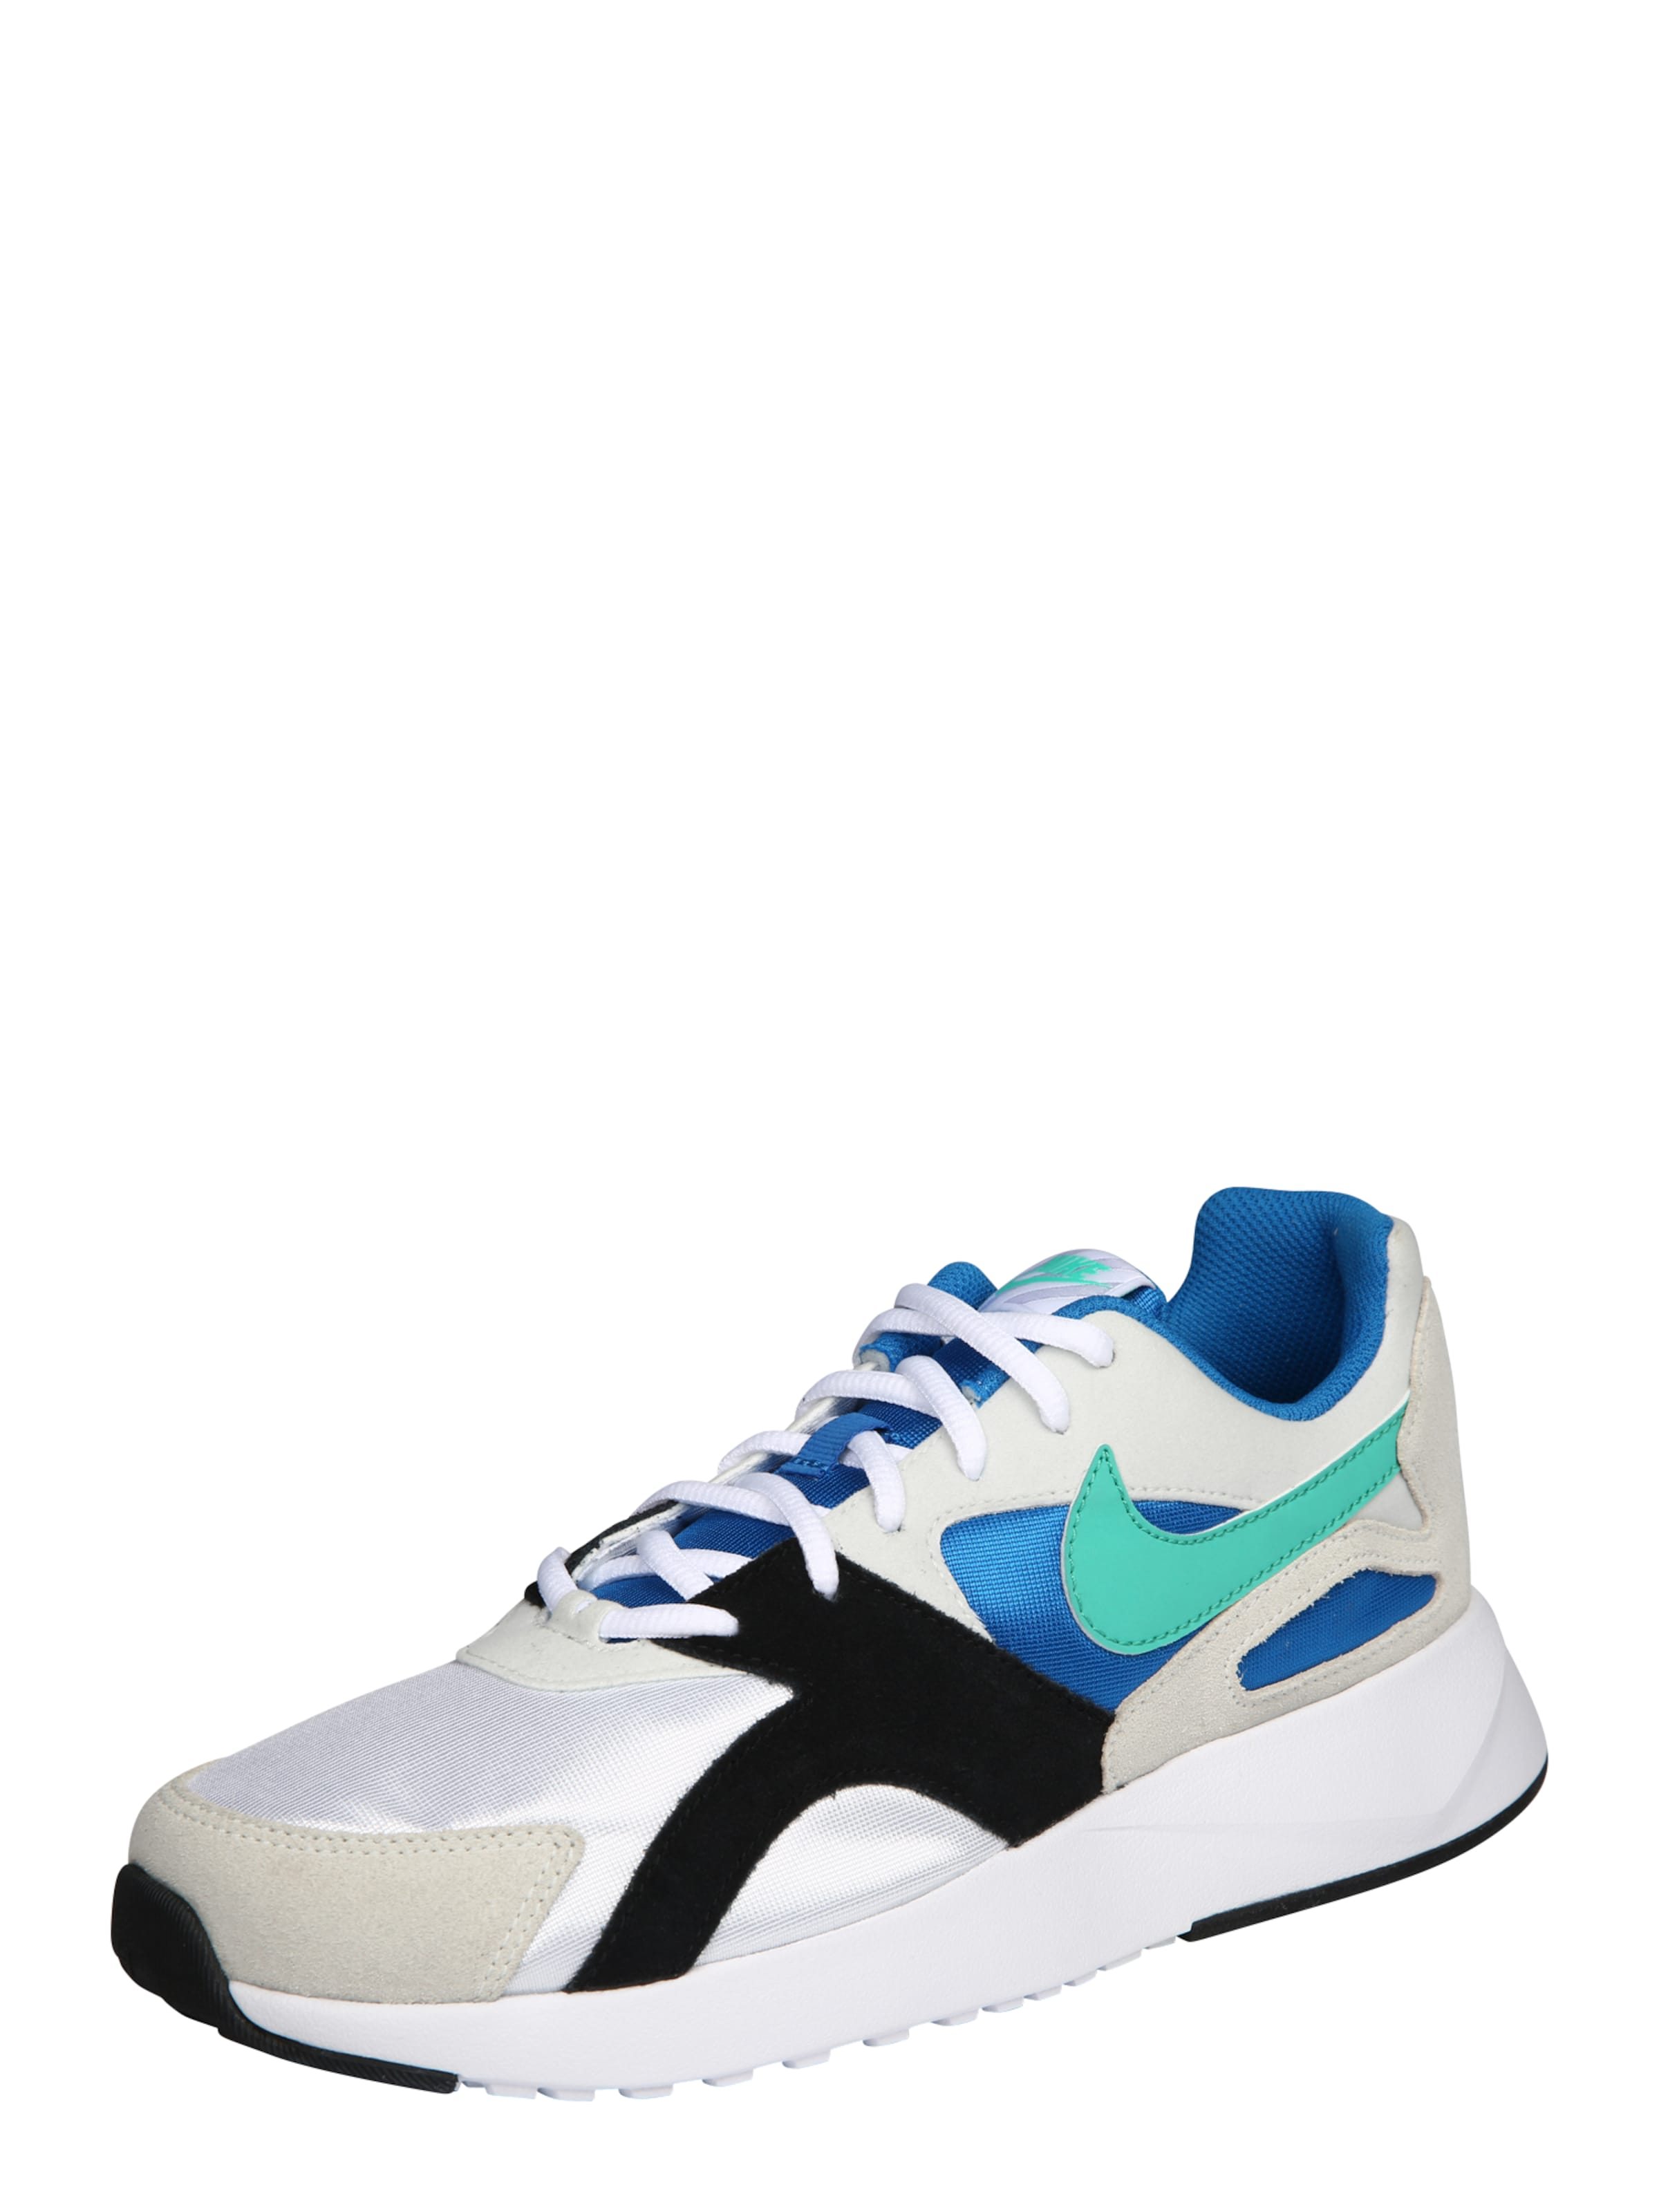 Nike Sportswear | Turnschuhe Pantheos